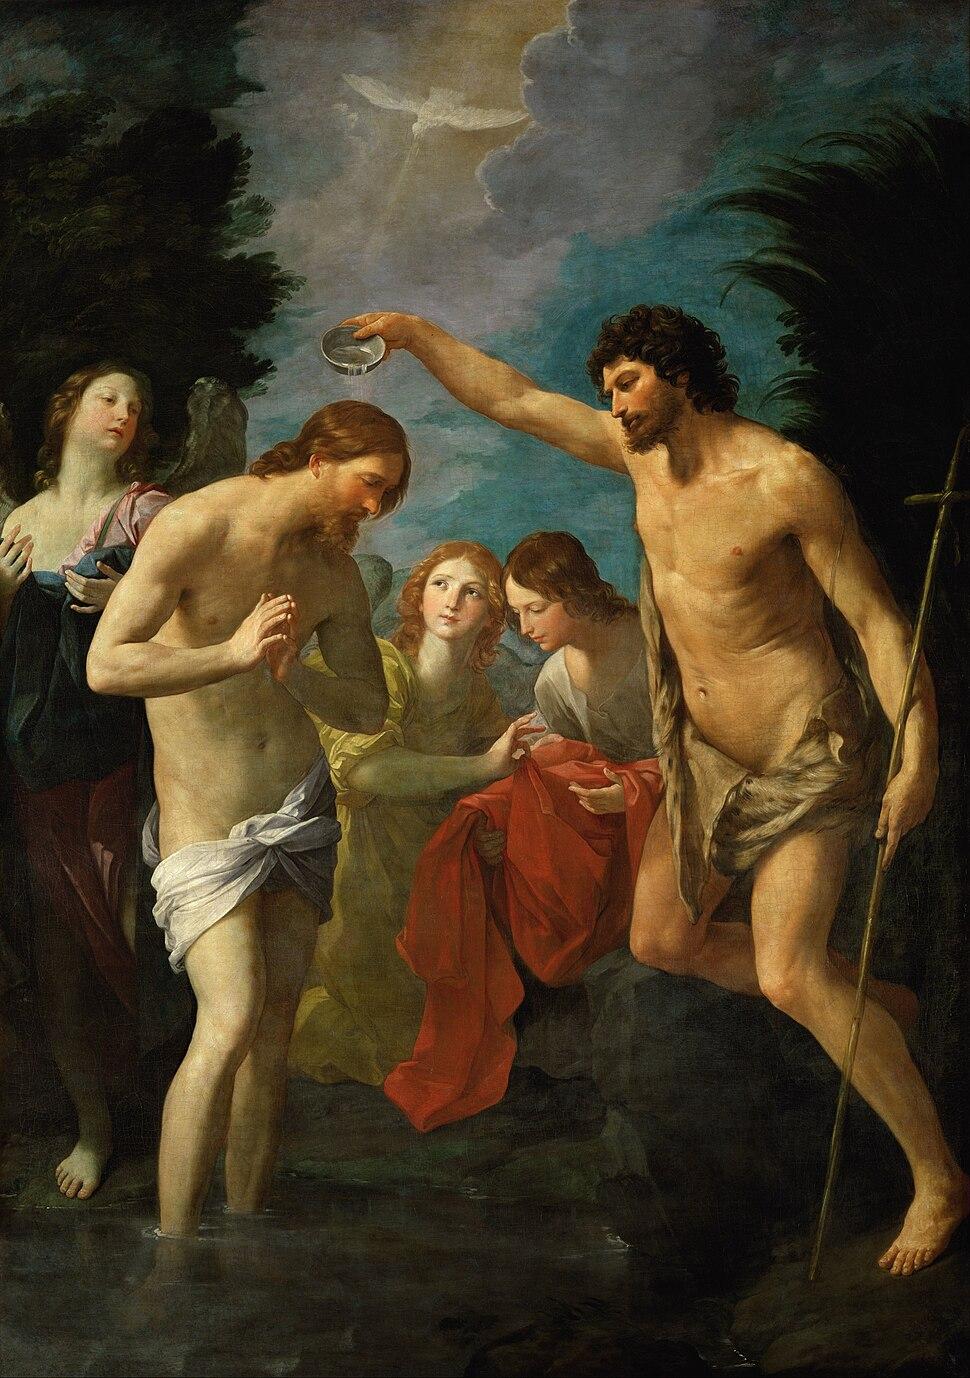 Guido Reni - The Baptism of Christ - Google Art Project